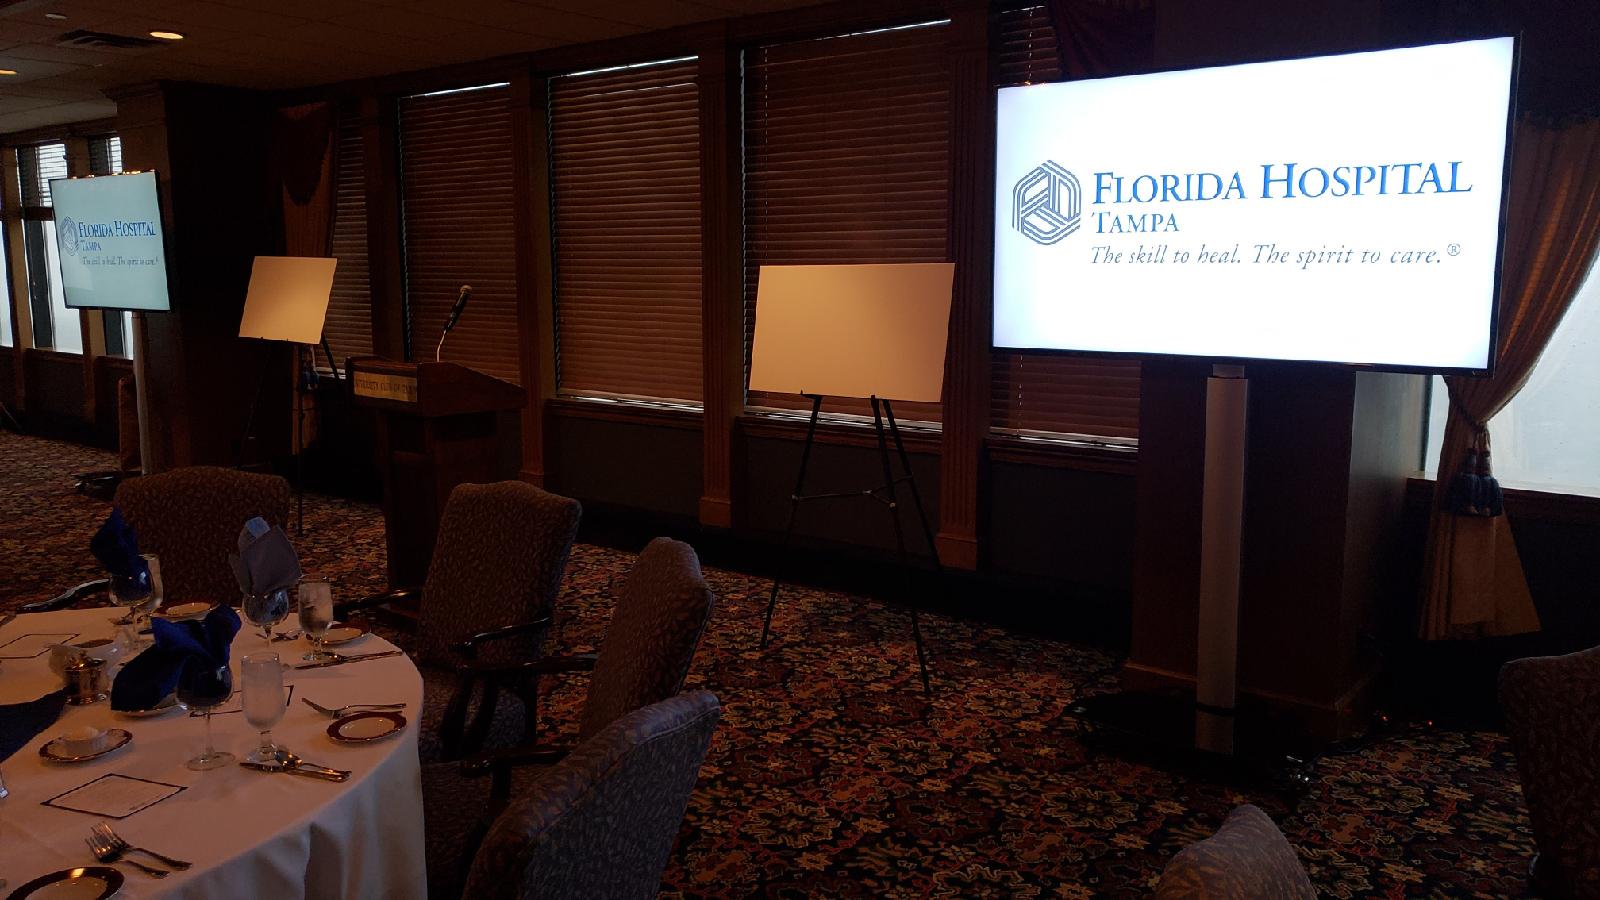 70-Inch-LCD-TVs-Florida-Hospital-Business-Seminar.jpg